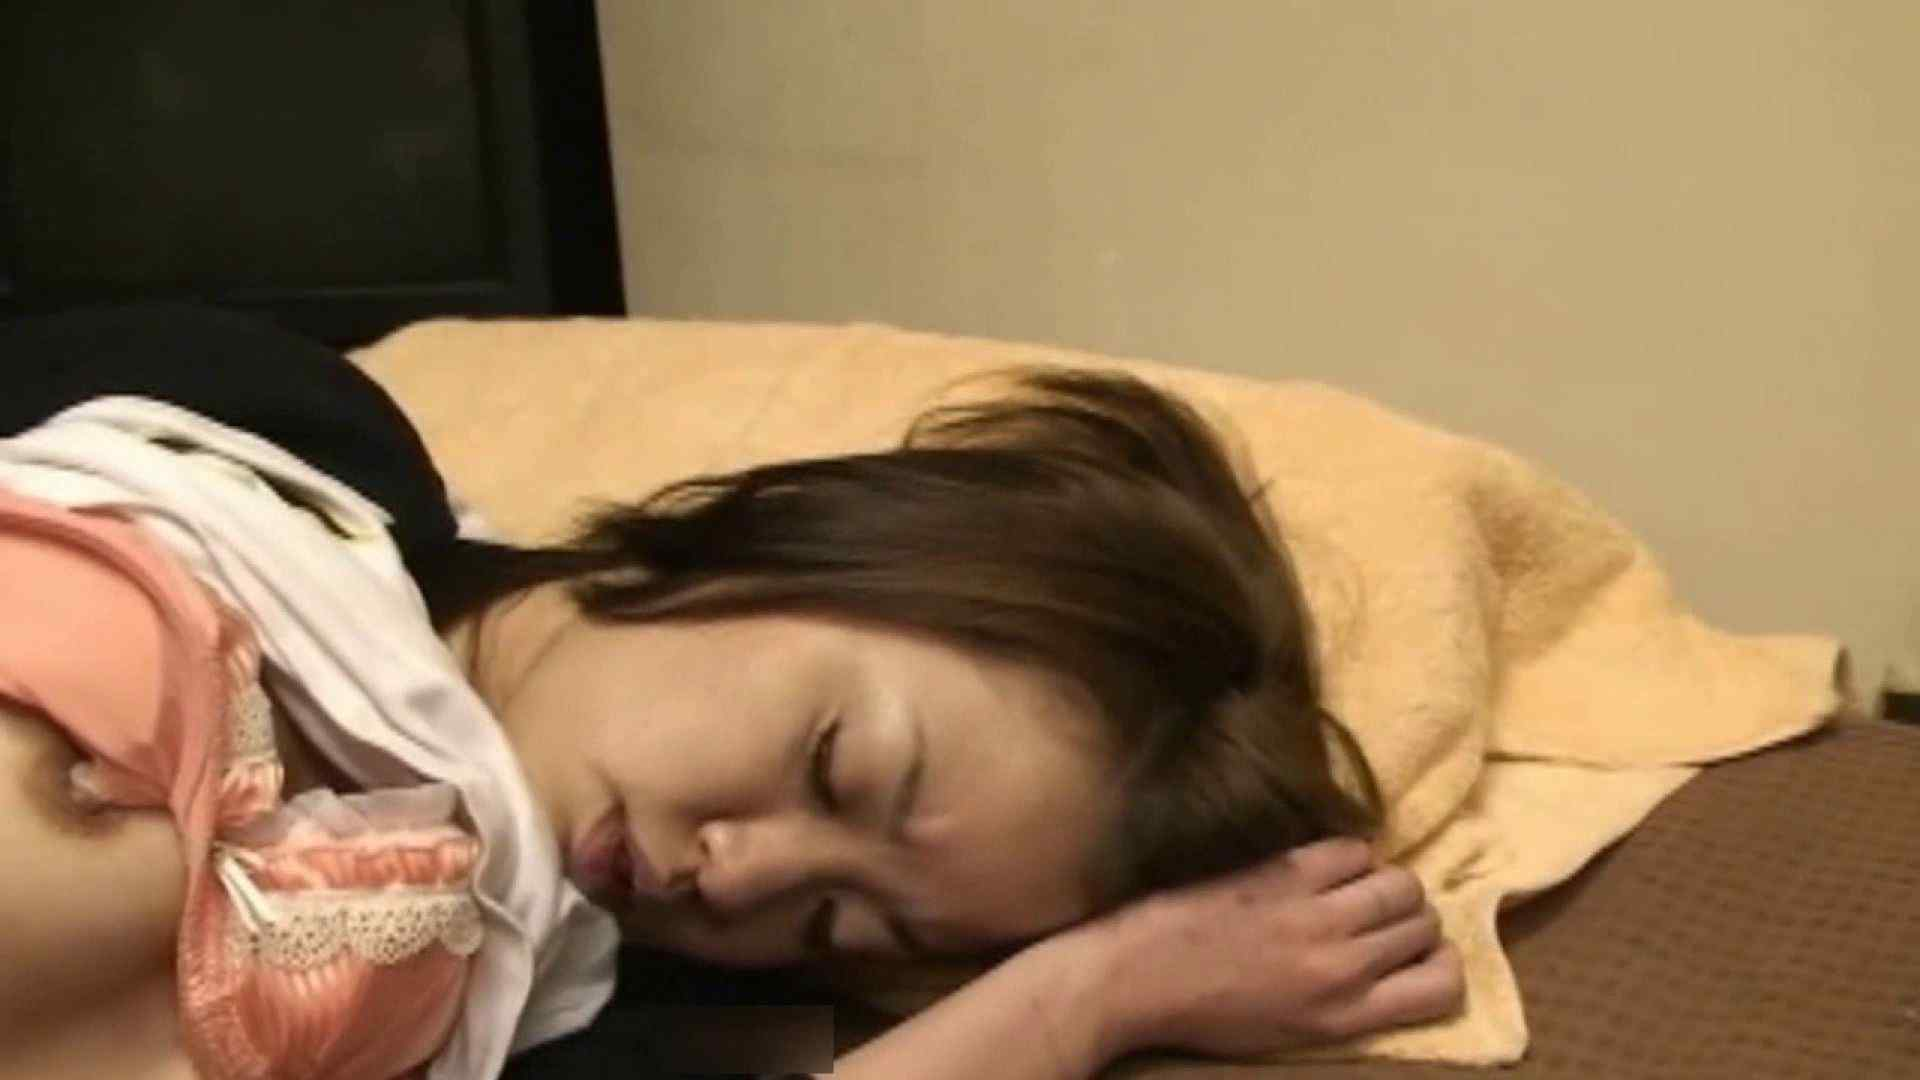 S級厳選美女ビッチガールVol.12 そそるぜモデル セックス無修正動画無料 68連発 7